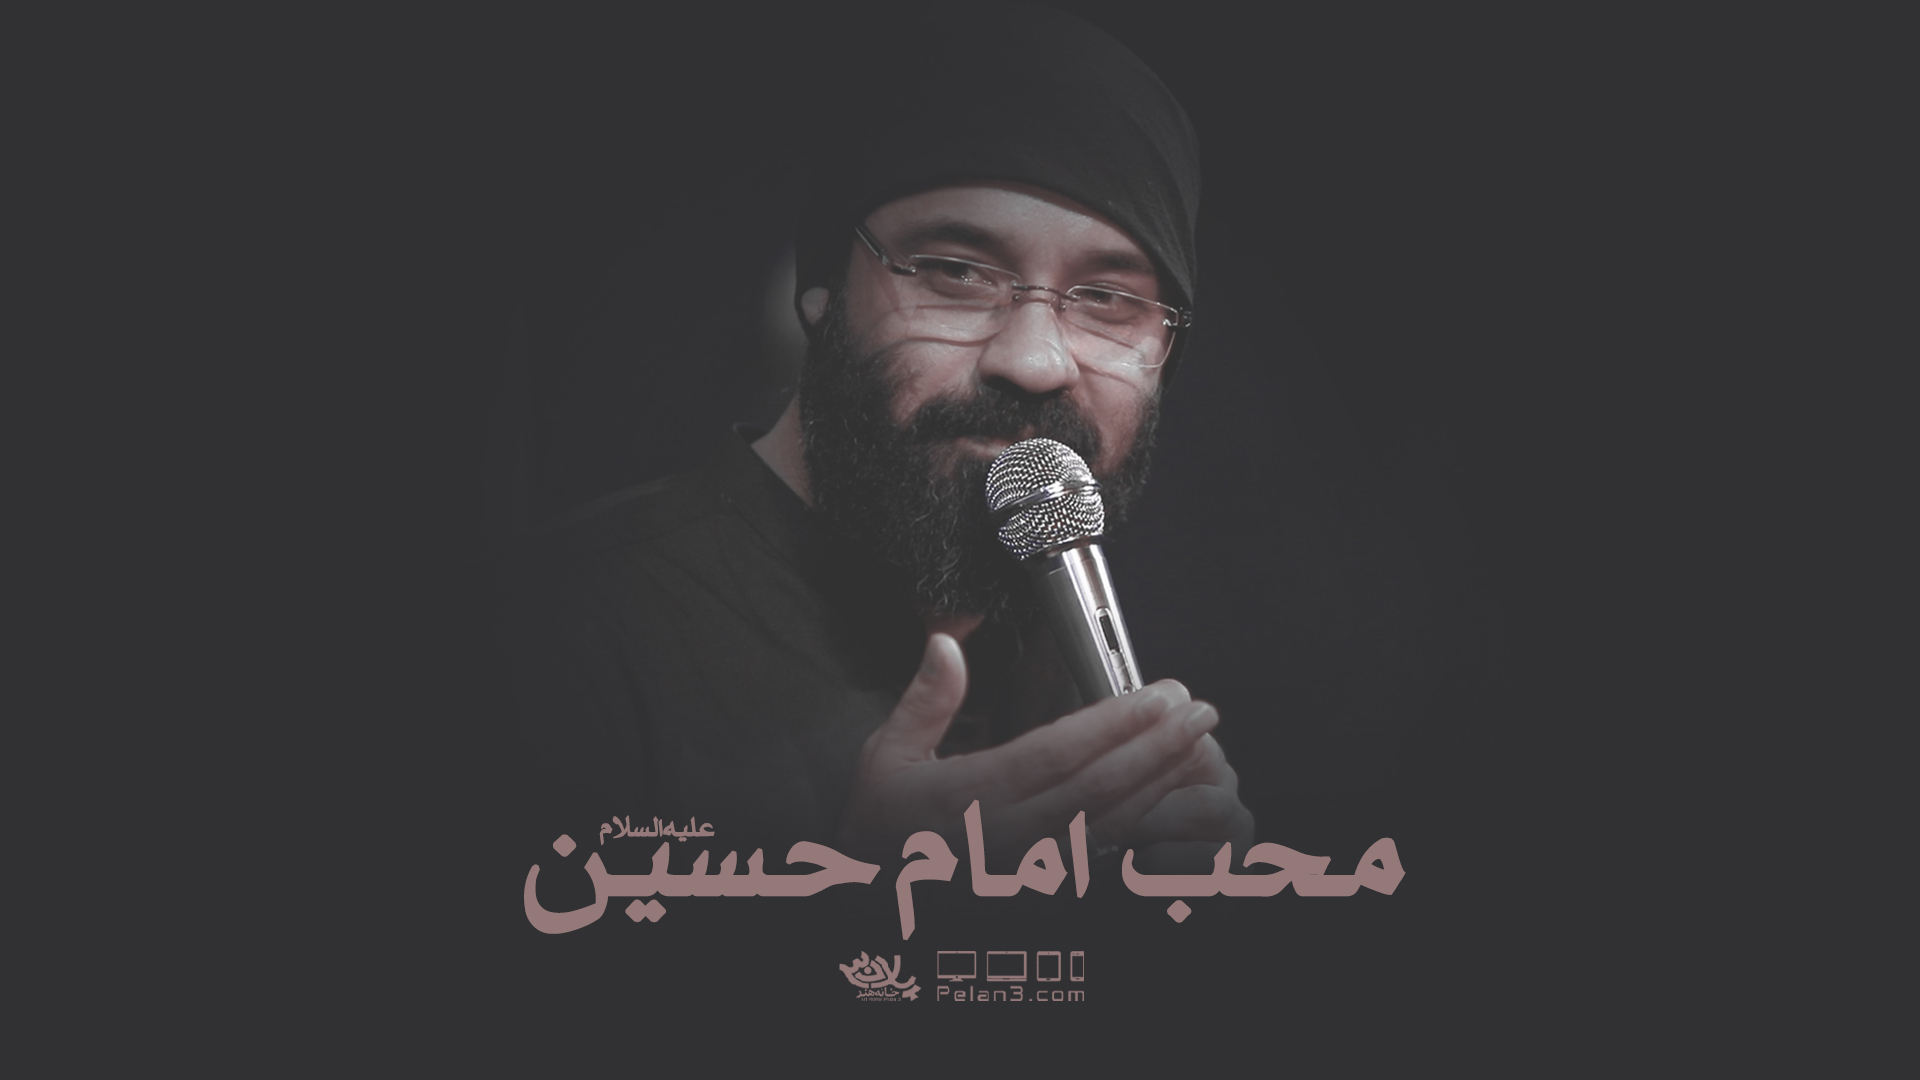 محب امام حسین عبدالرضا هلالی